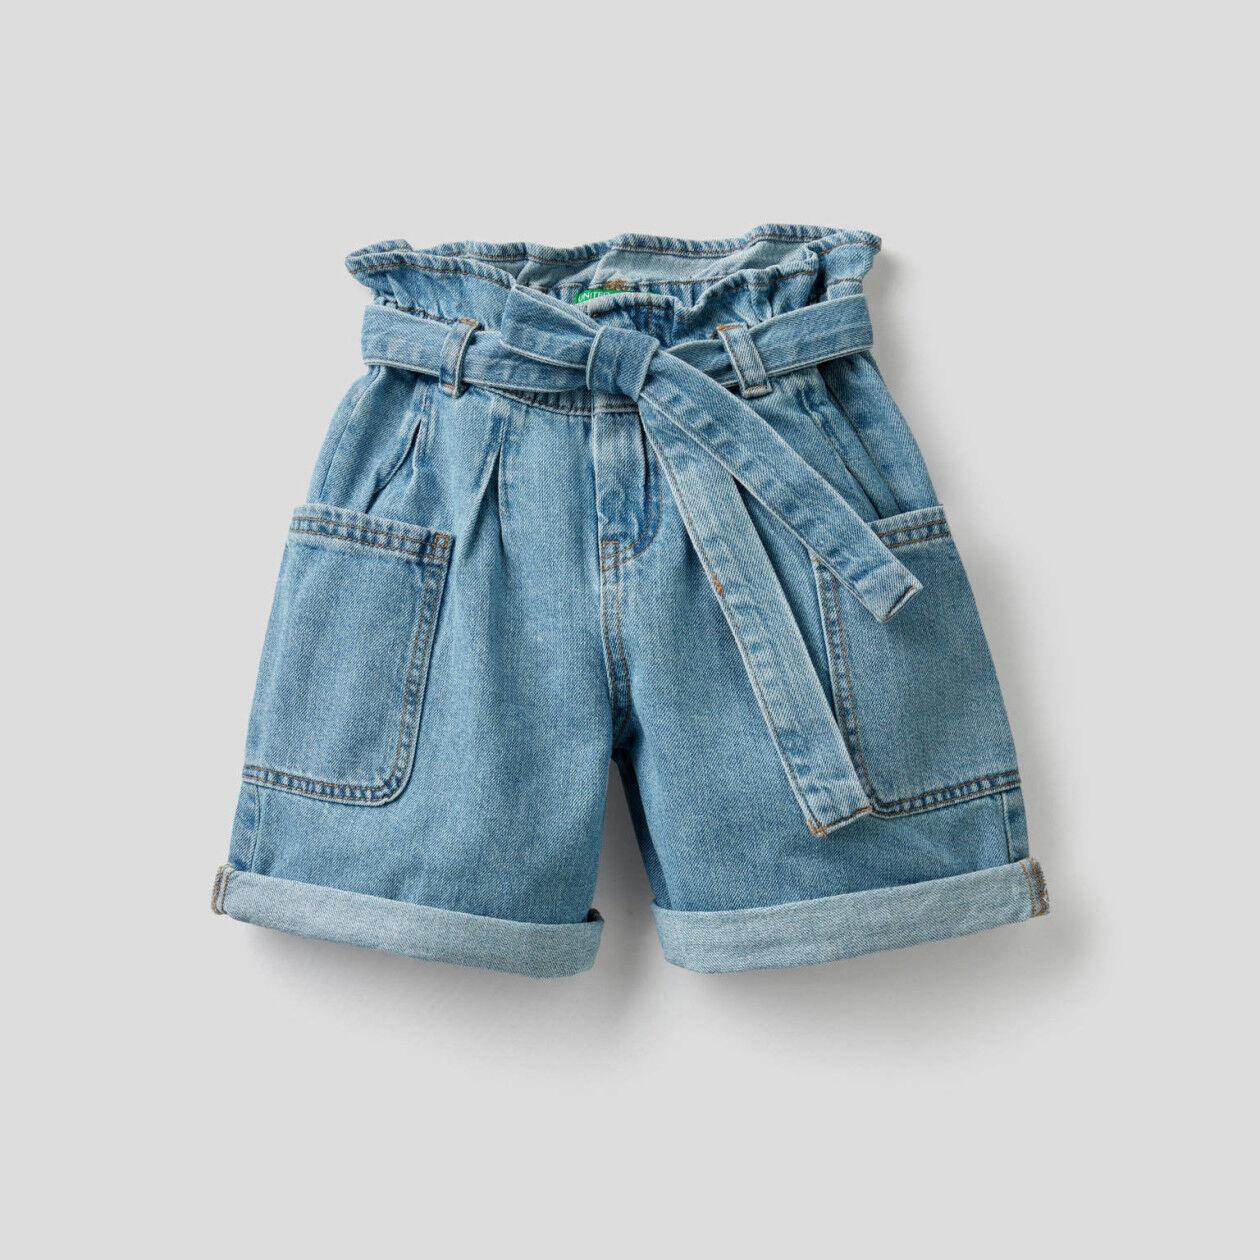 Shorts in pure cotton denim